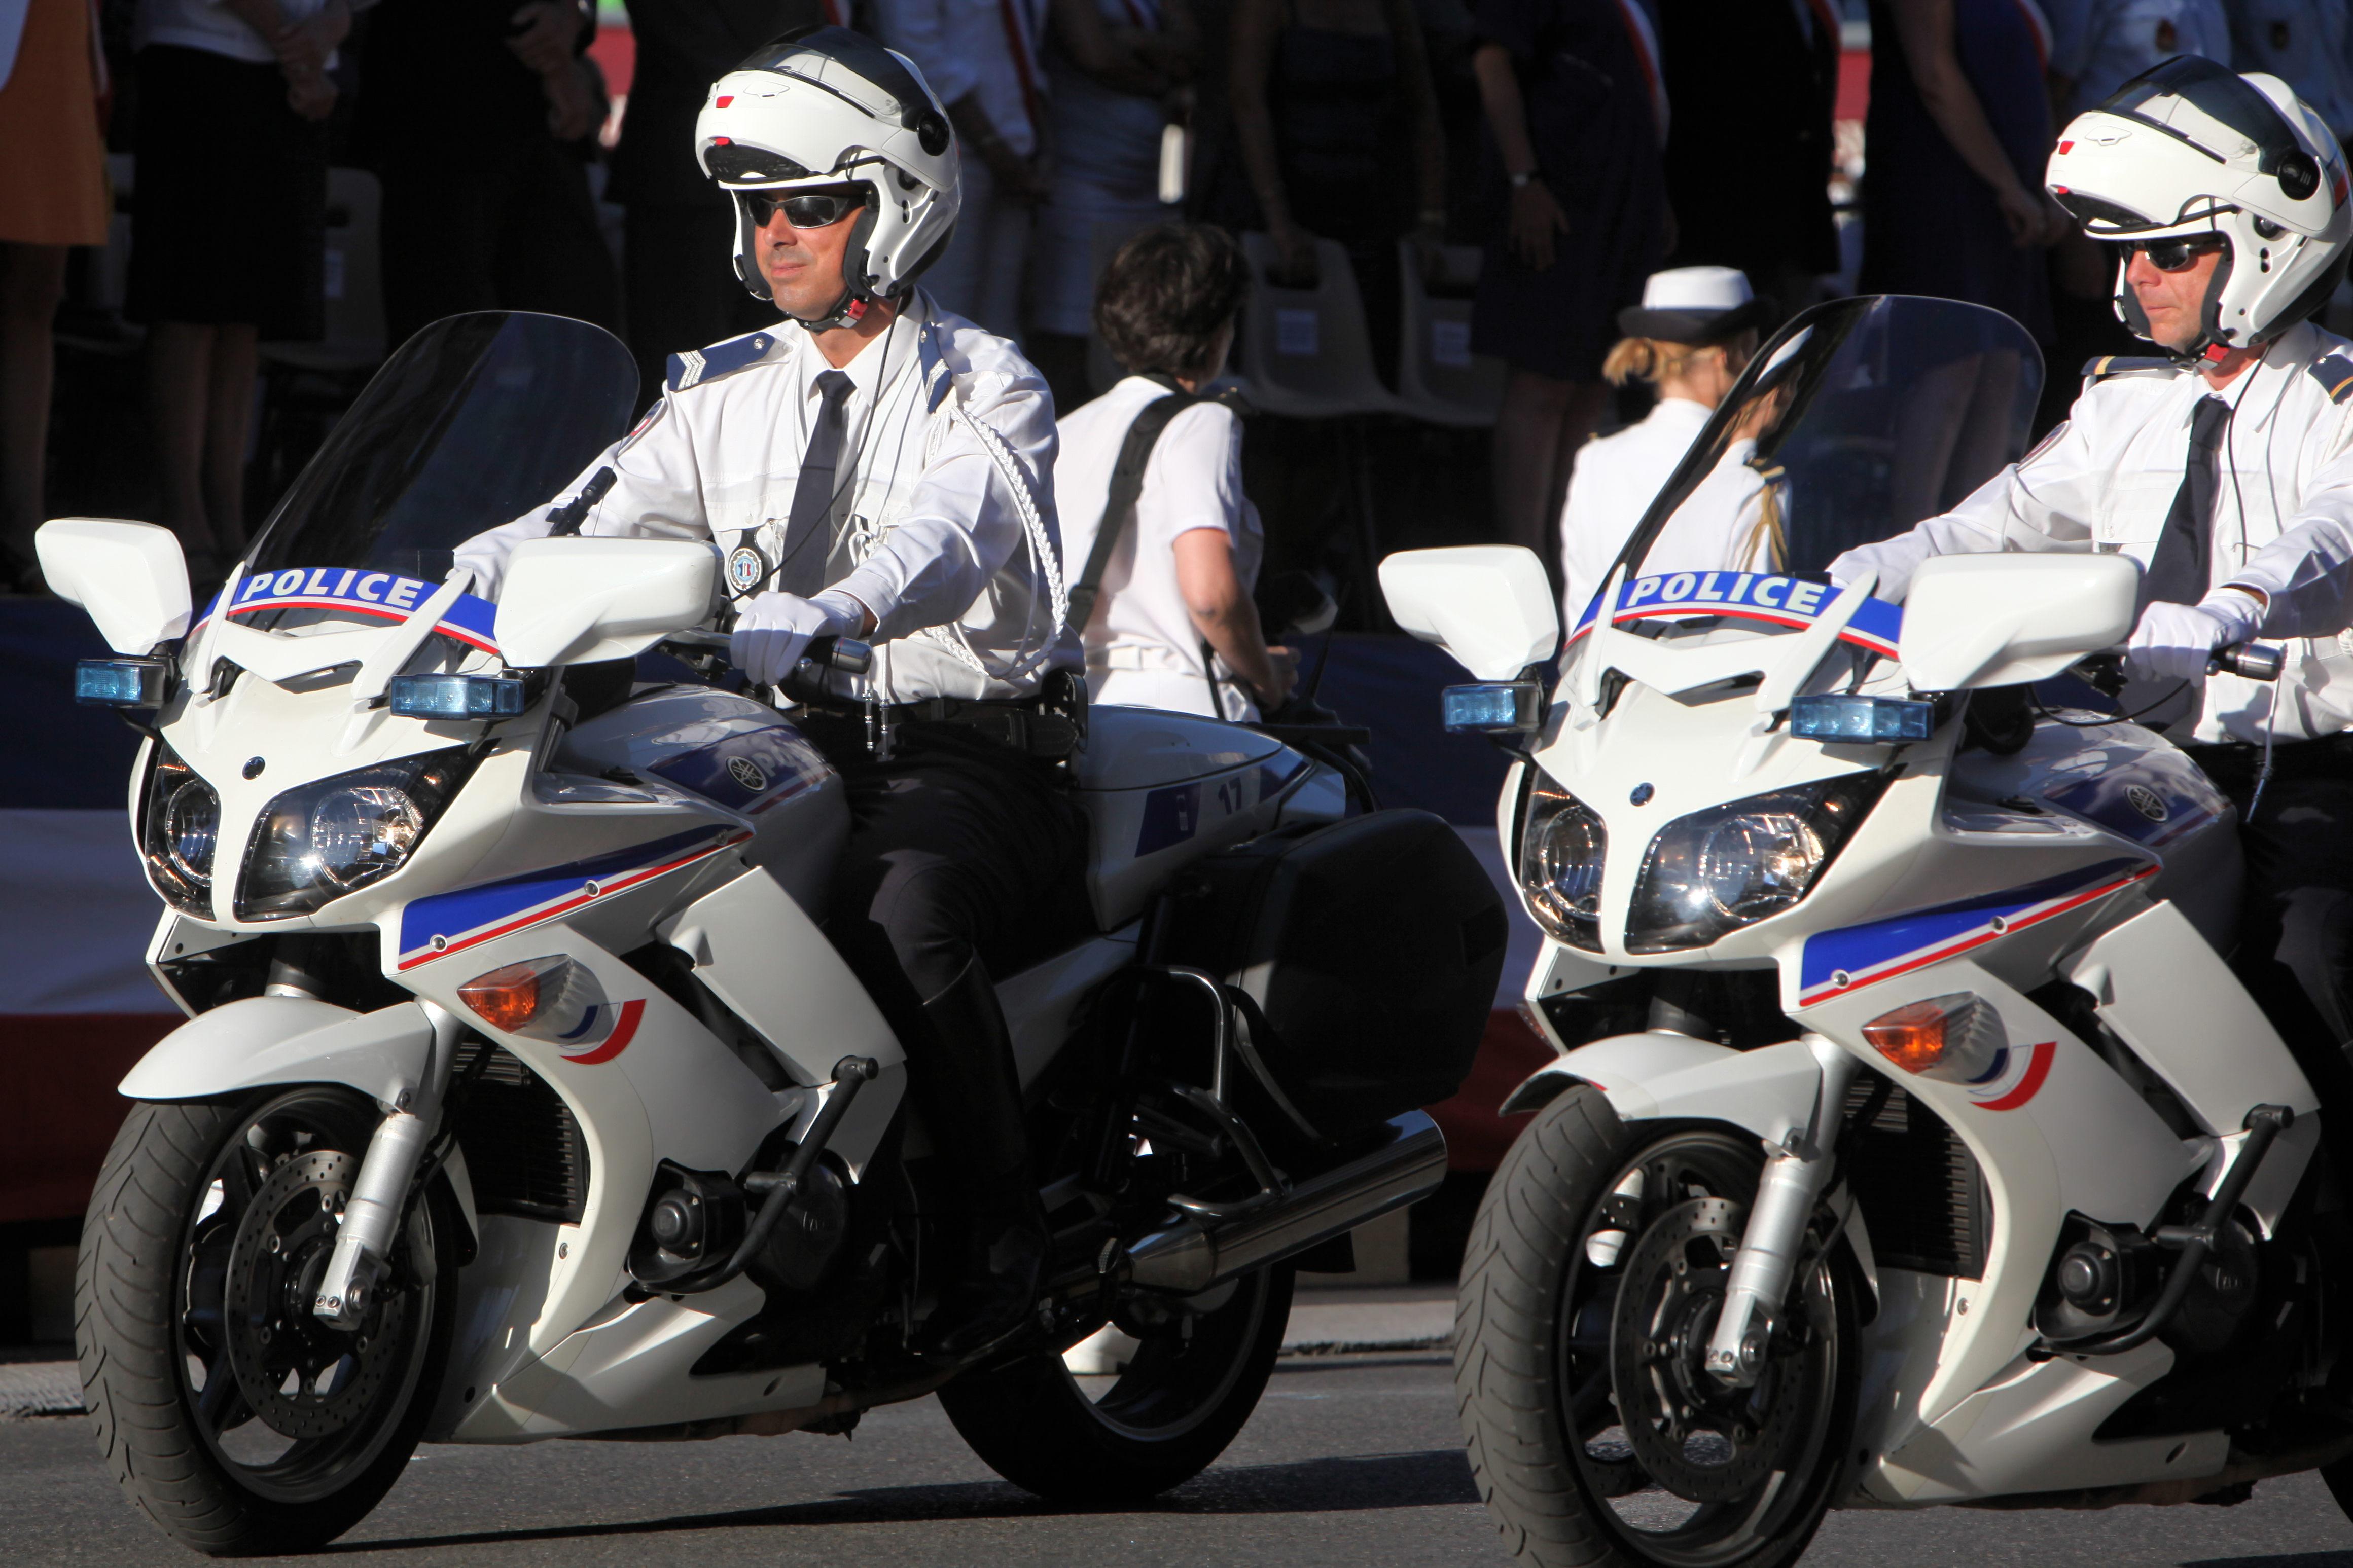 File:Police-IMG 9236.jpg